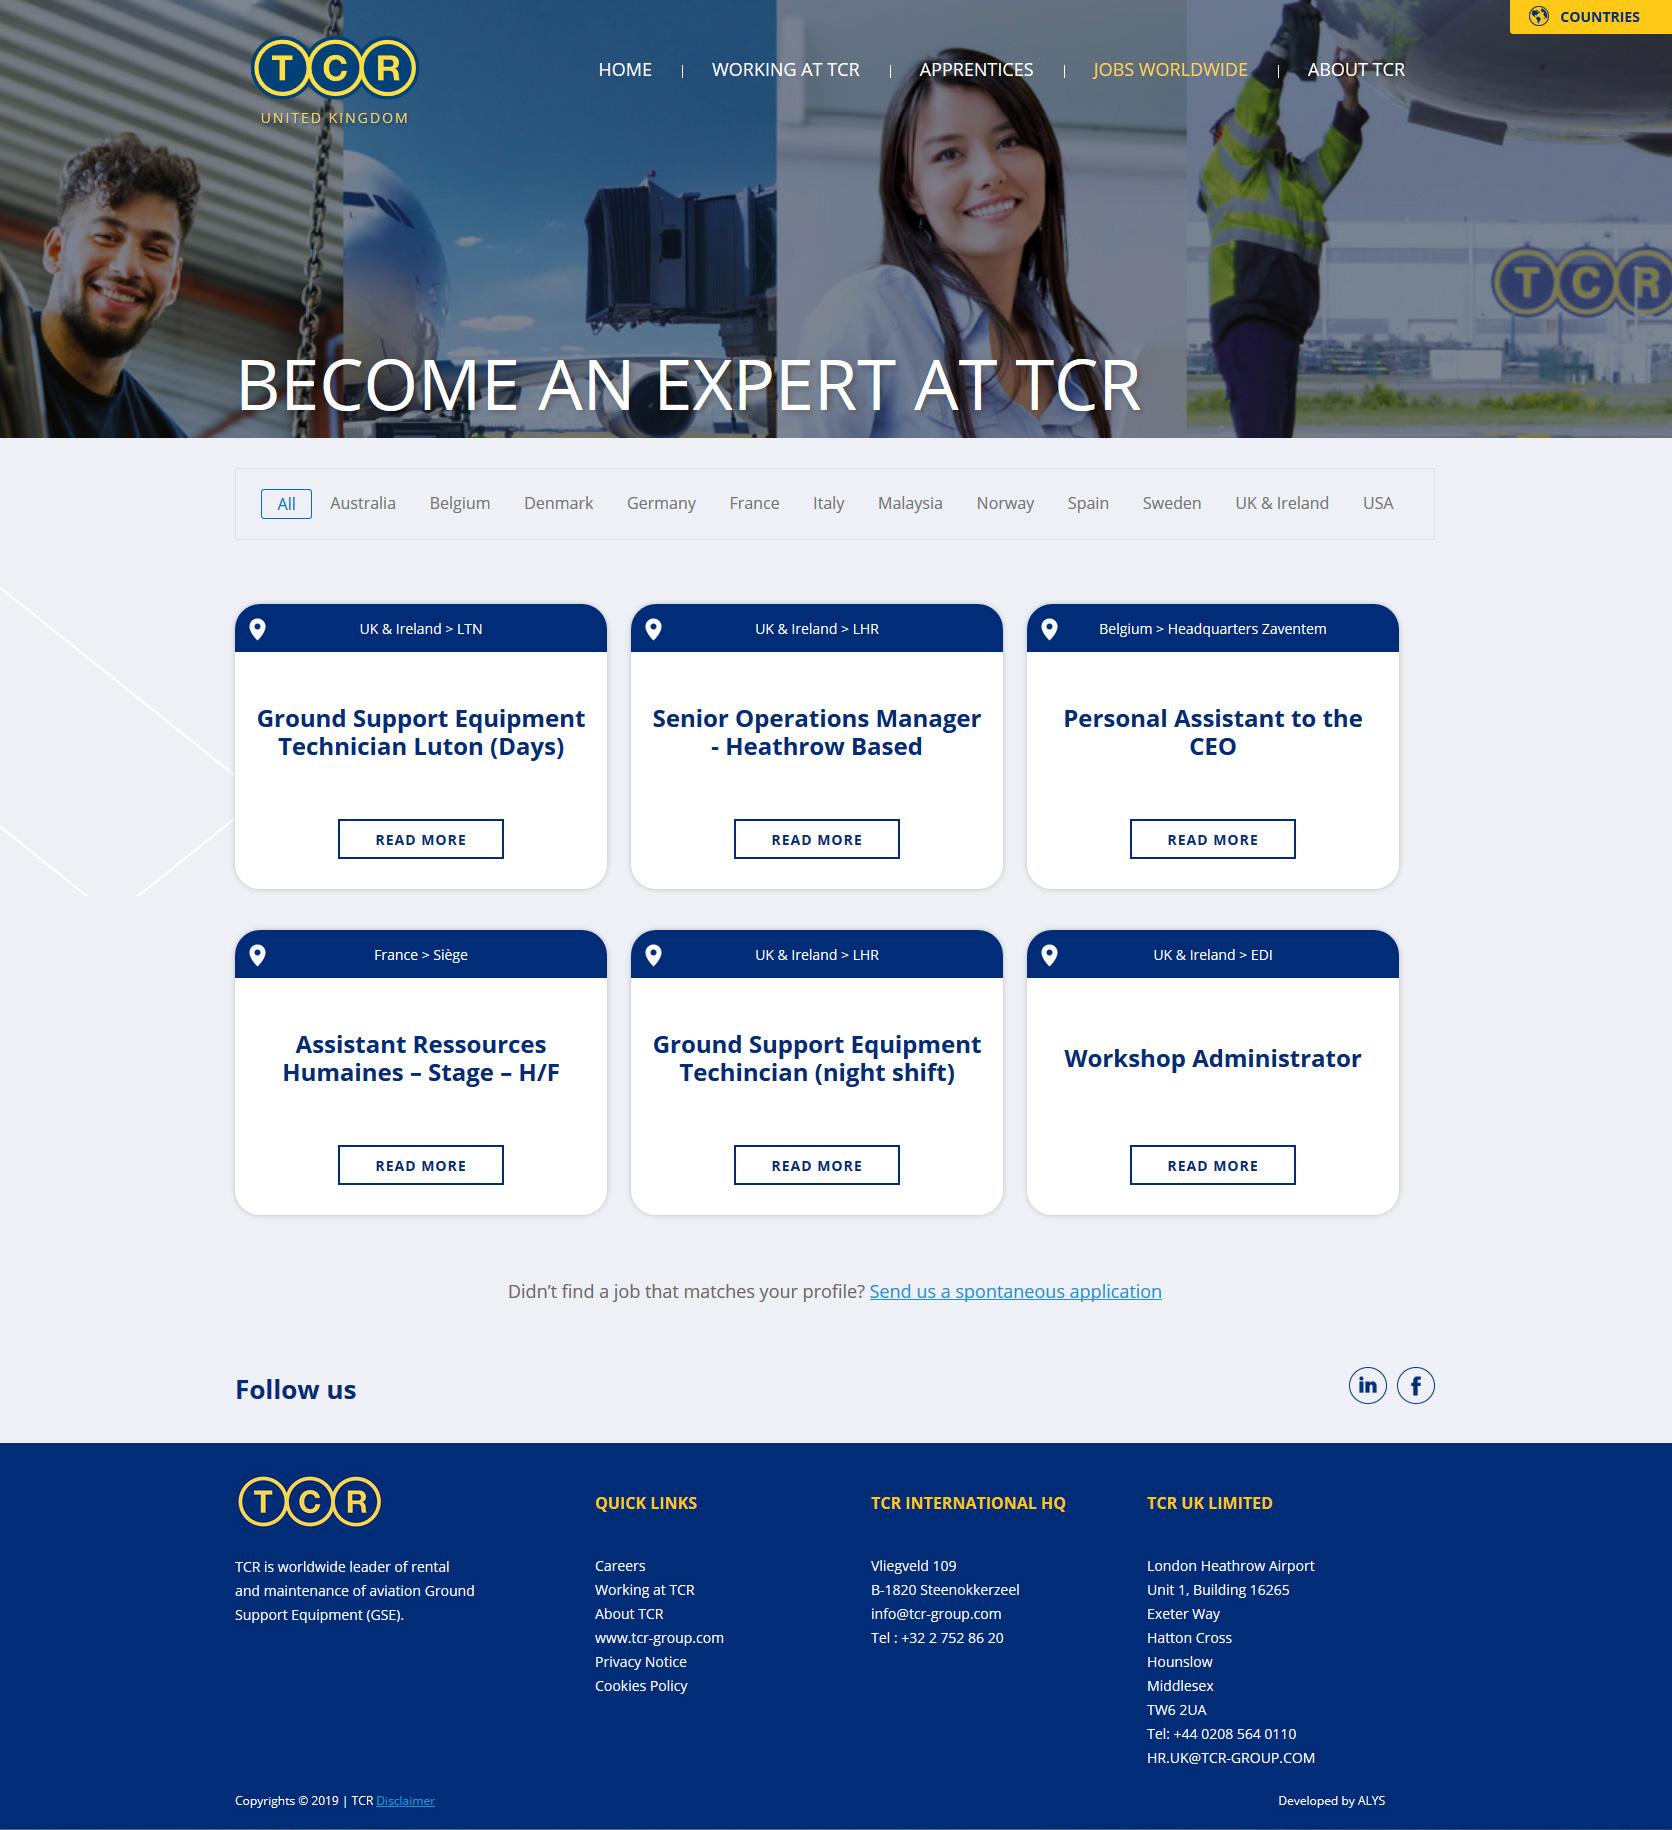 ALYS projet - TCR Group